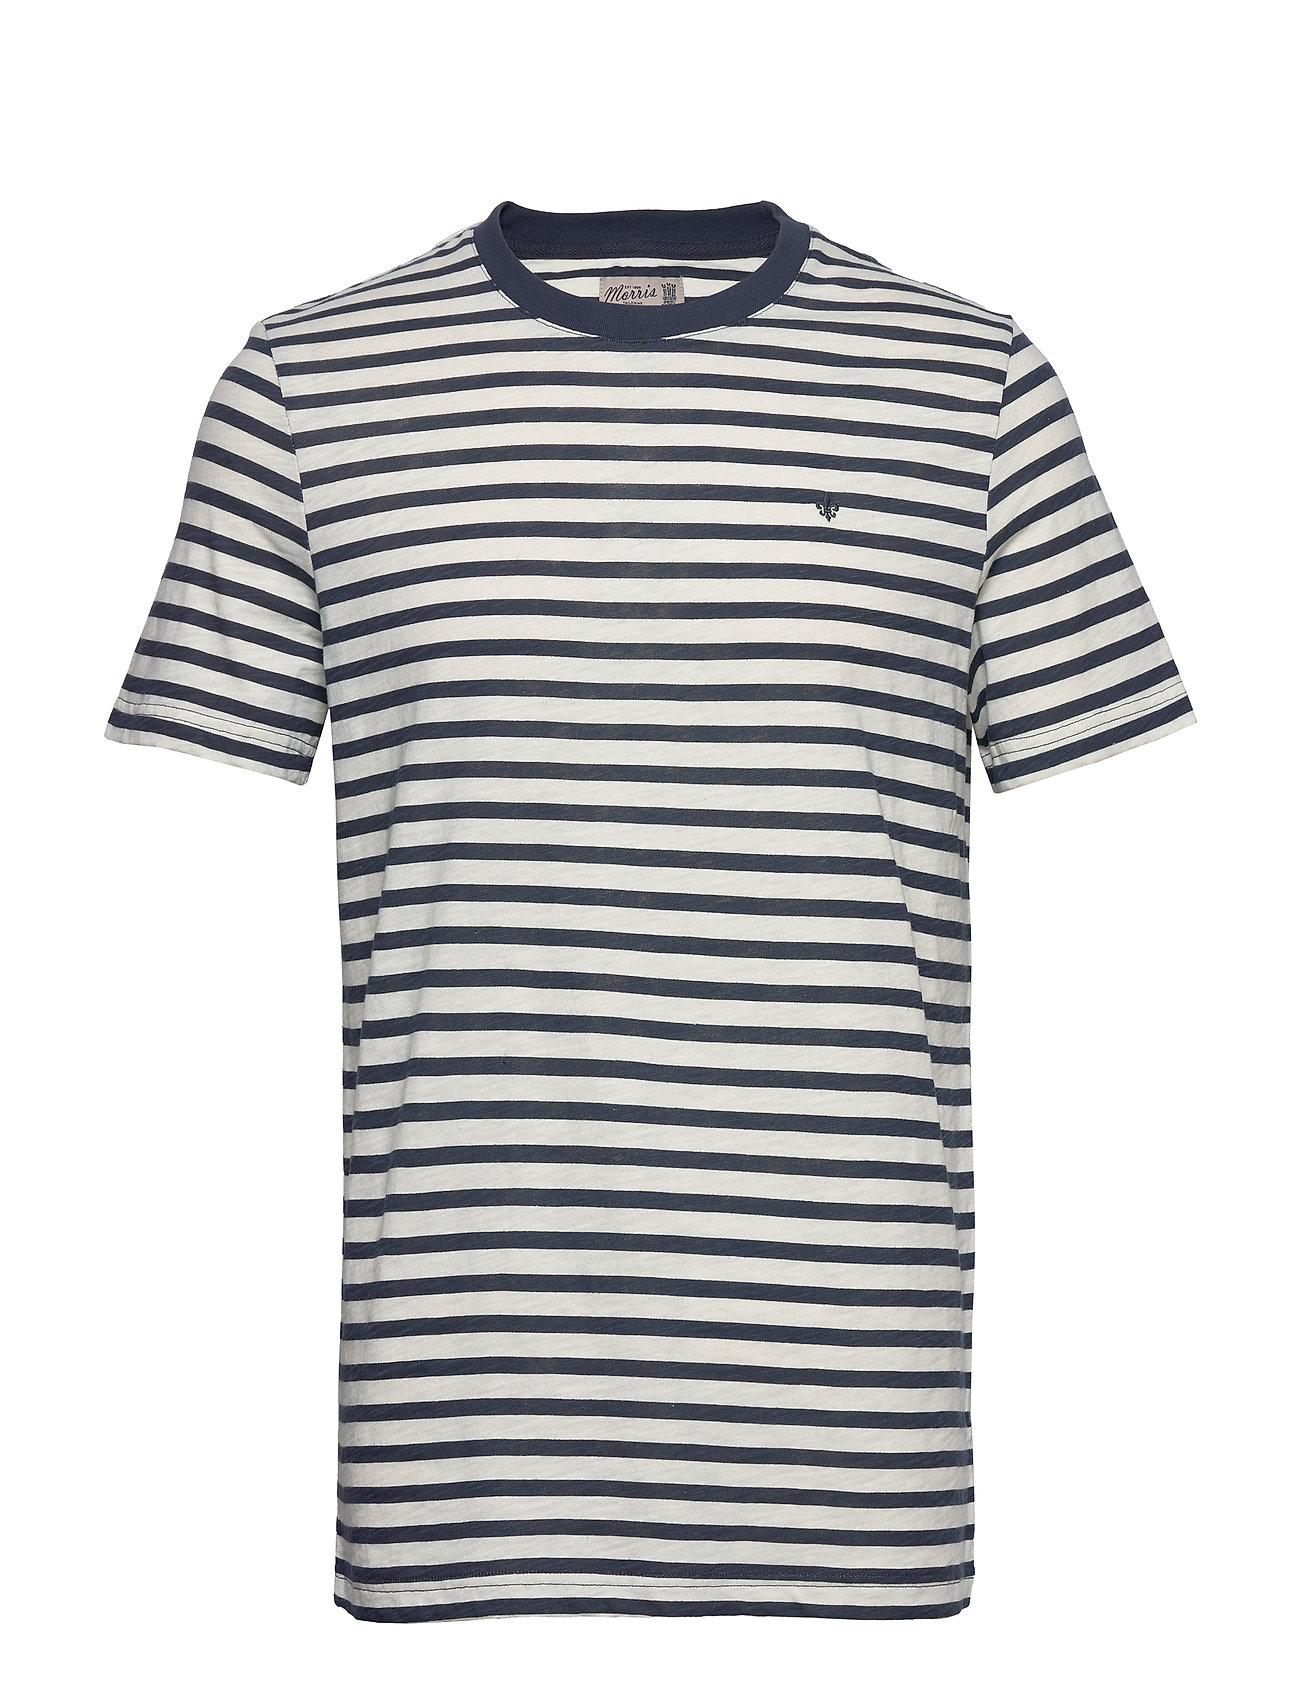 Image of Morris Stripe Tee T-shirt Blå Morris (3421208583)